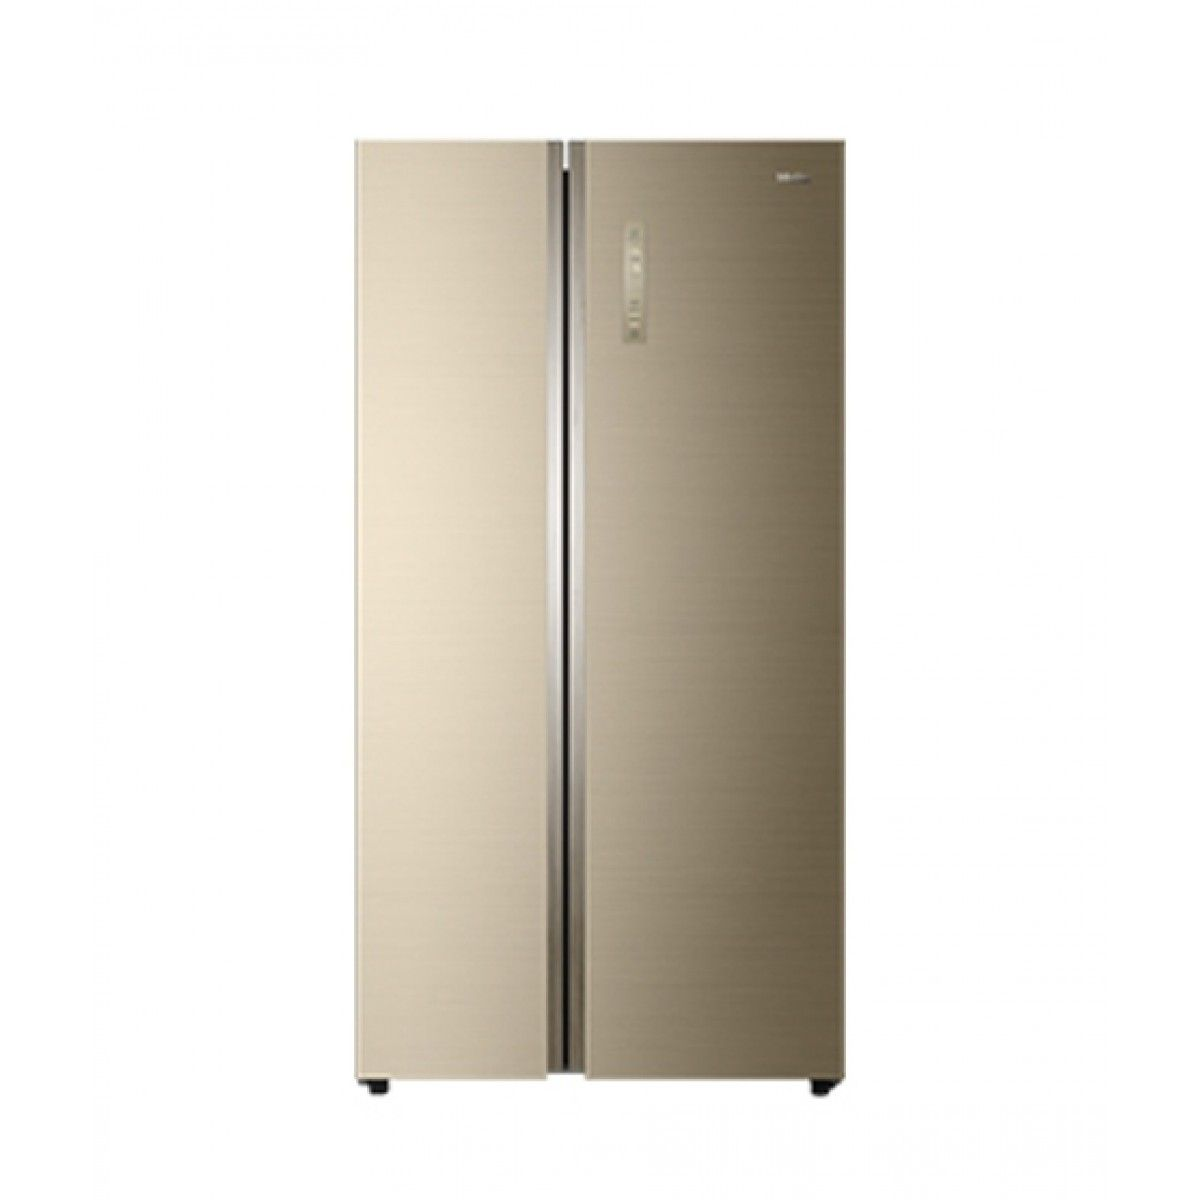 Haier HRF-618GG 17 cu ft Refrigerator